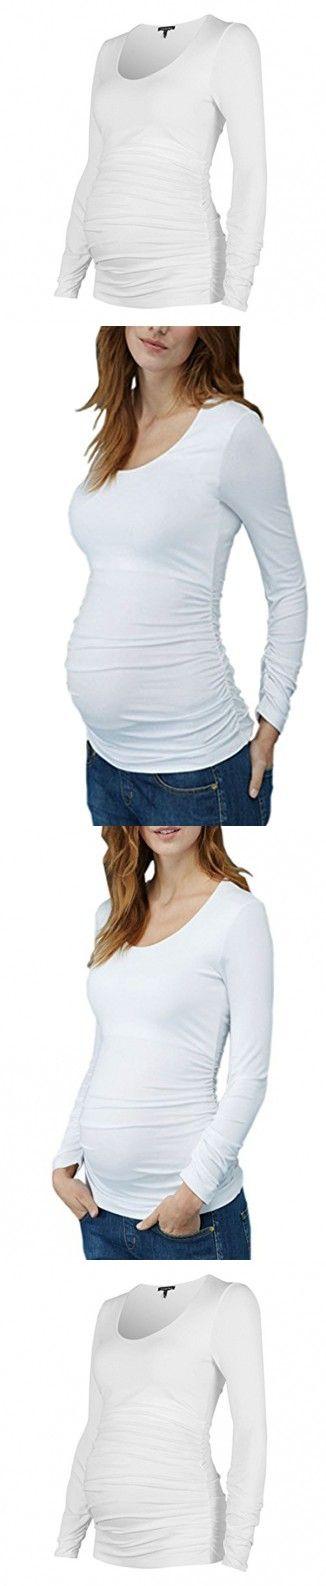 Jinson Women's Motherhood Maternity Tops Clothes Nursing Side Ruched Long Sleeve Crew Neck Tunic Shirt White L